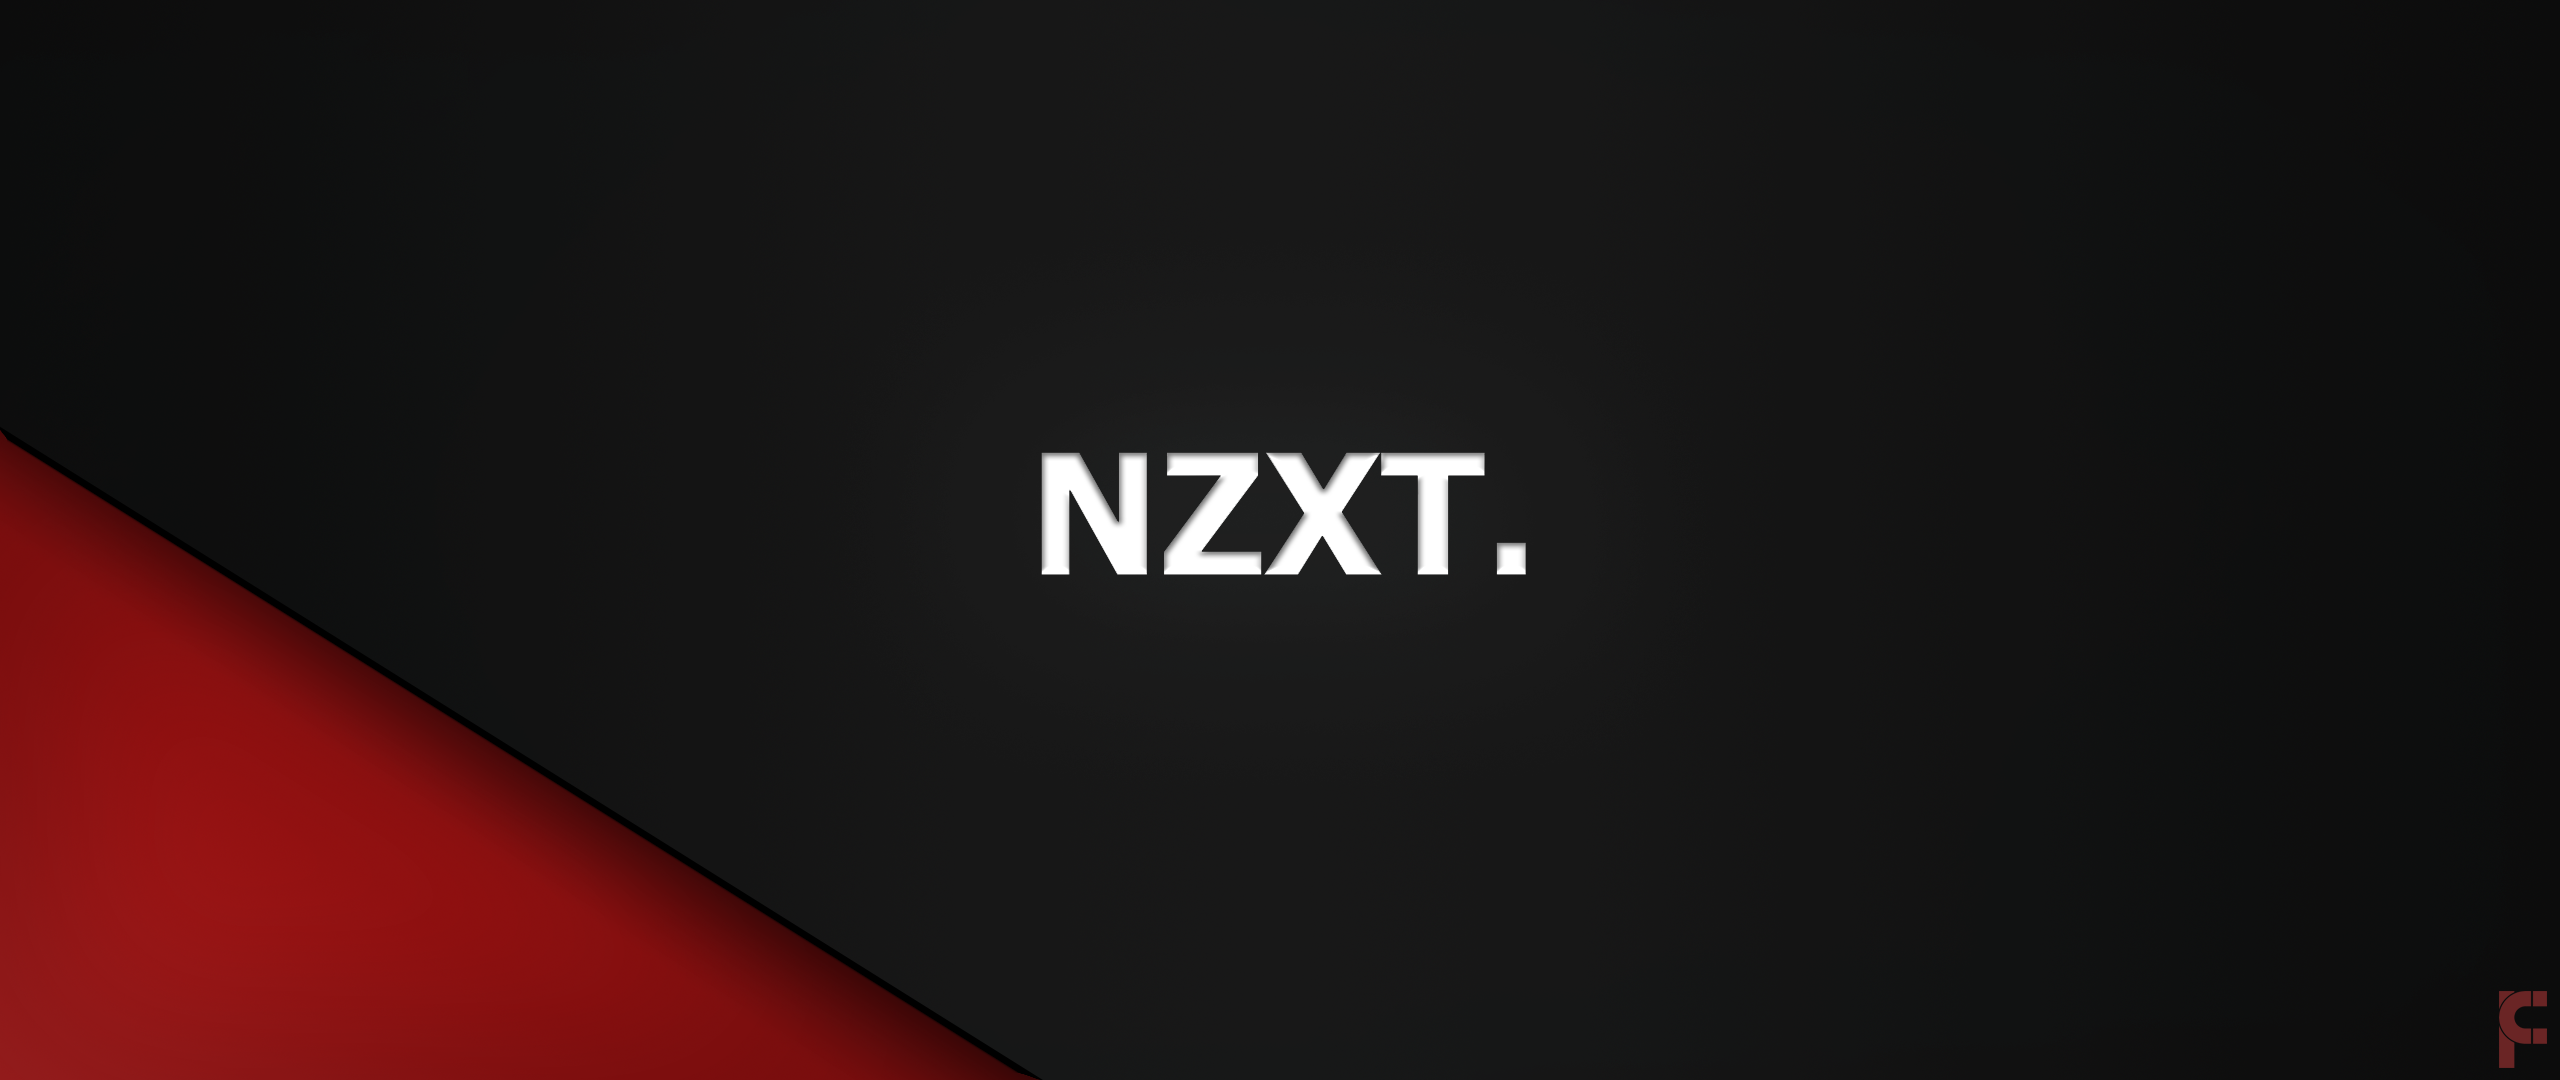 Nzxt Hd Wallpaper Background Image 2560x1080 Id989909